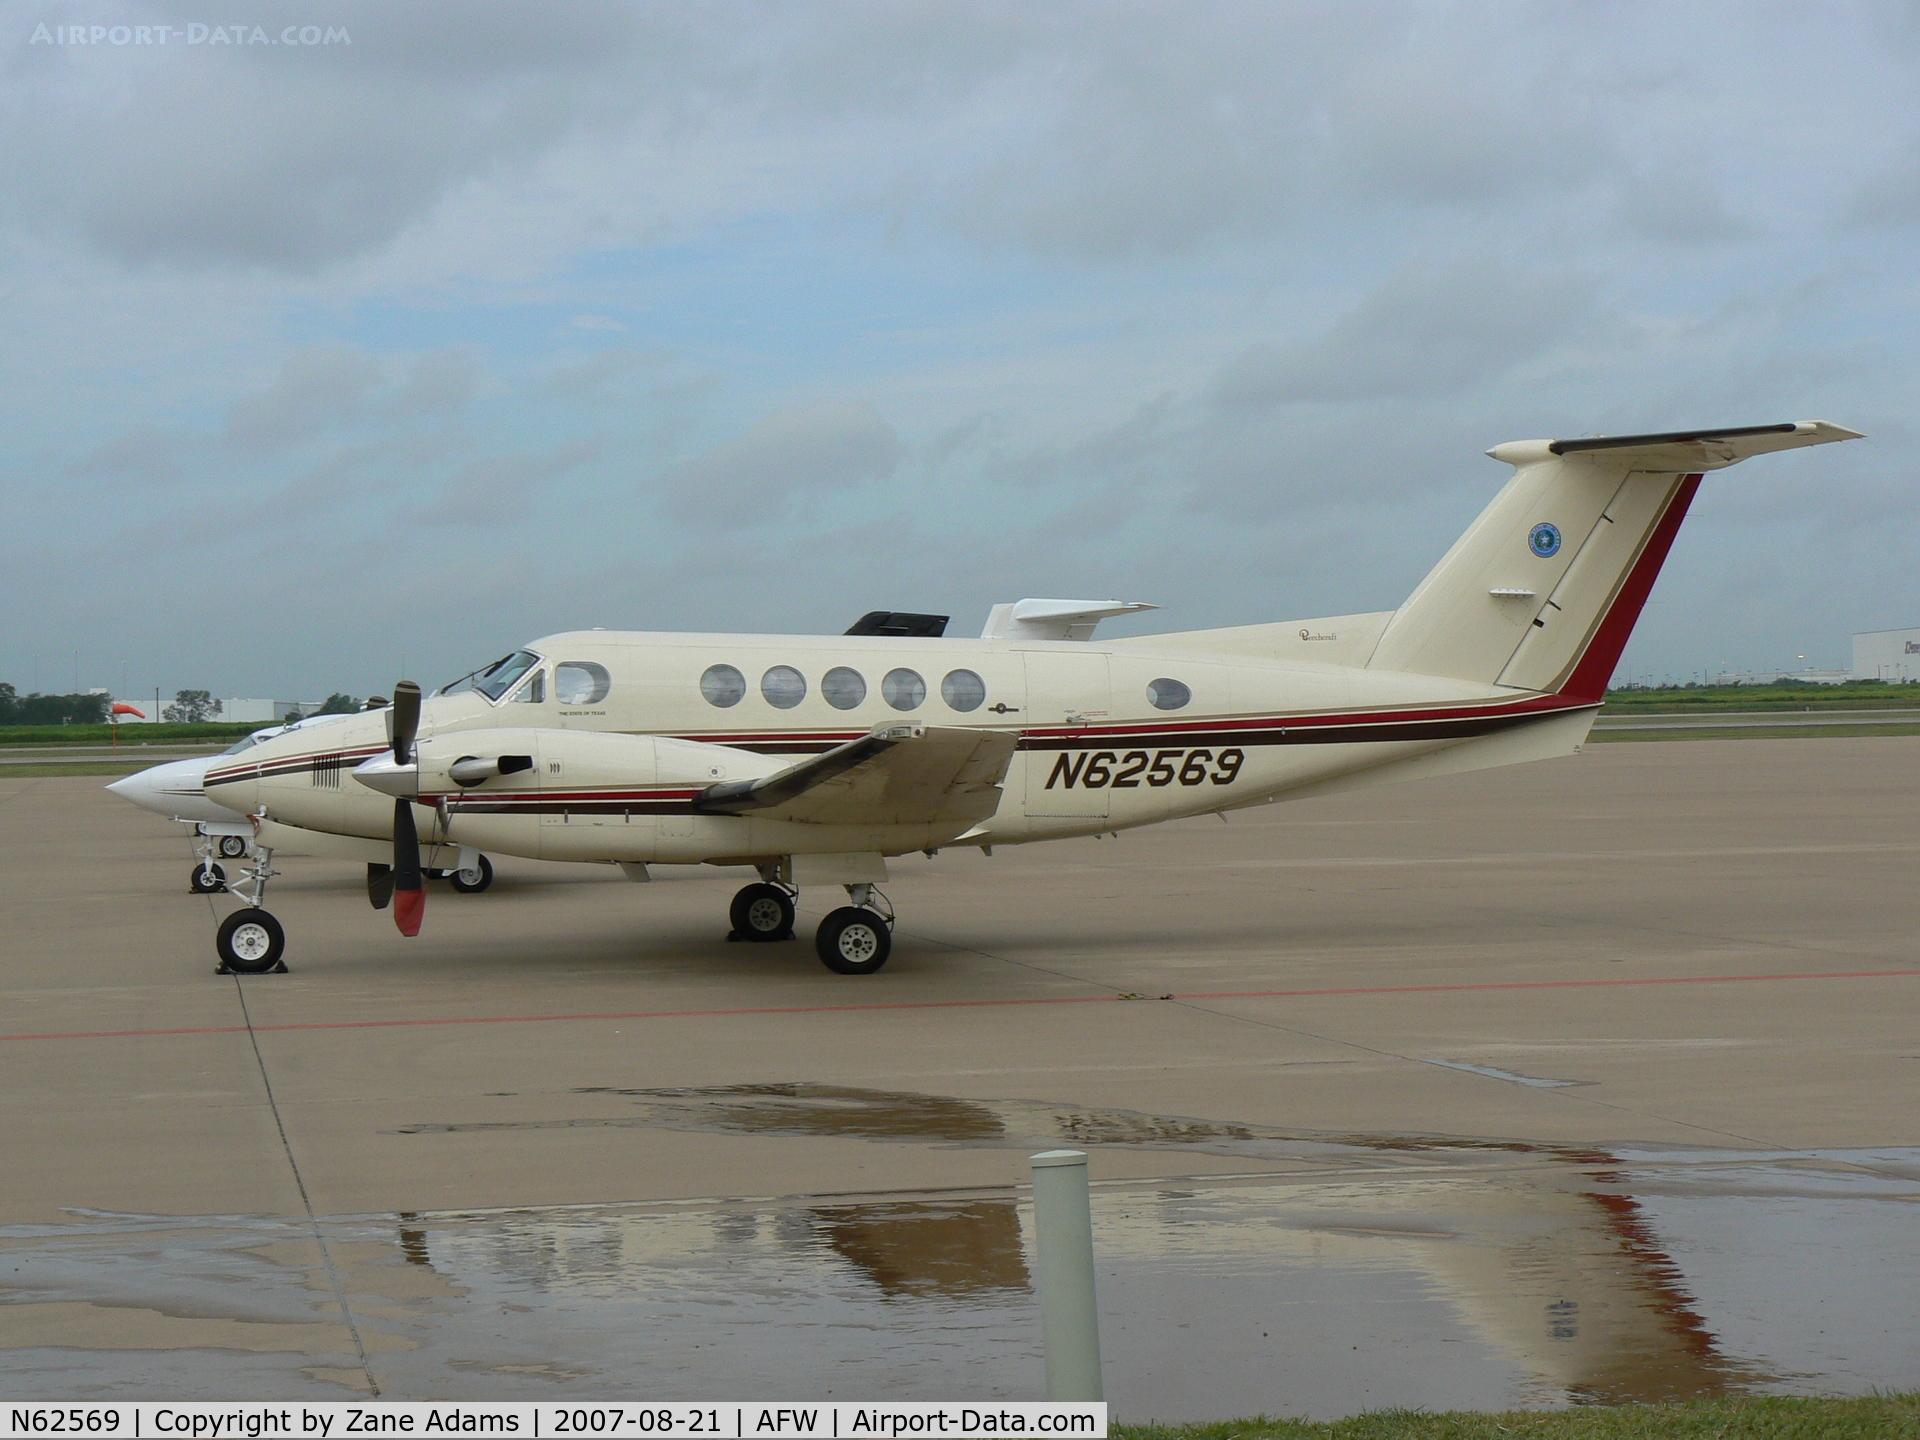 N62569, 1982 Beech B200 King Air C/N BB-1028, State of Texas Logo on tail - TXDOT